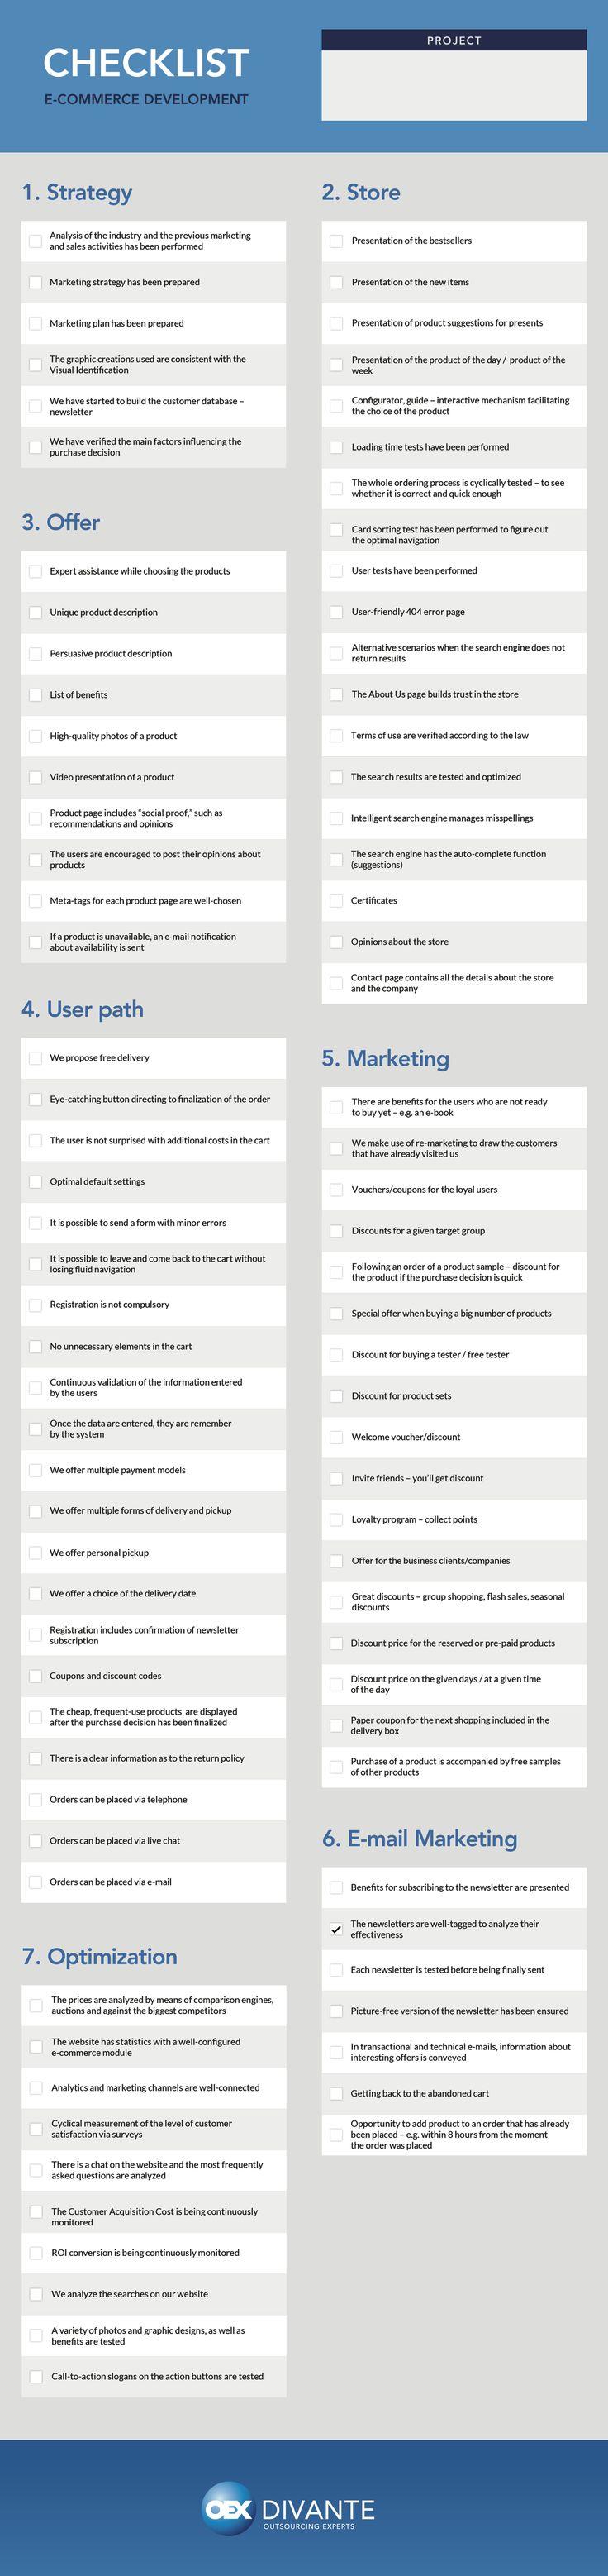 E-commerce Developement Checklist  #ecommerce #Strategy #Store #Offer #Marketing  #Optimization